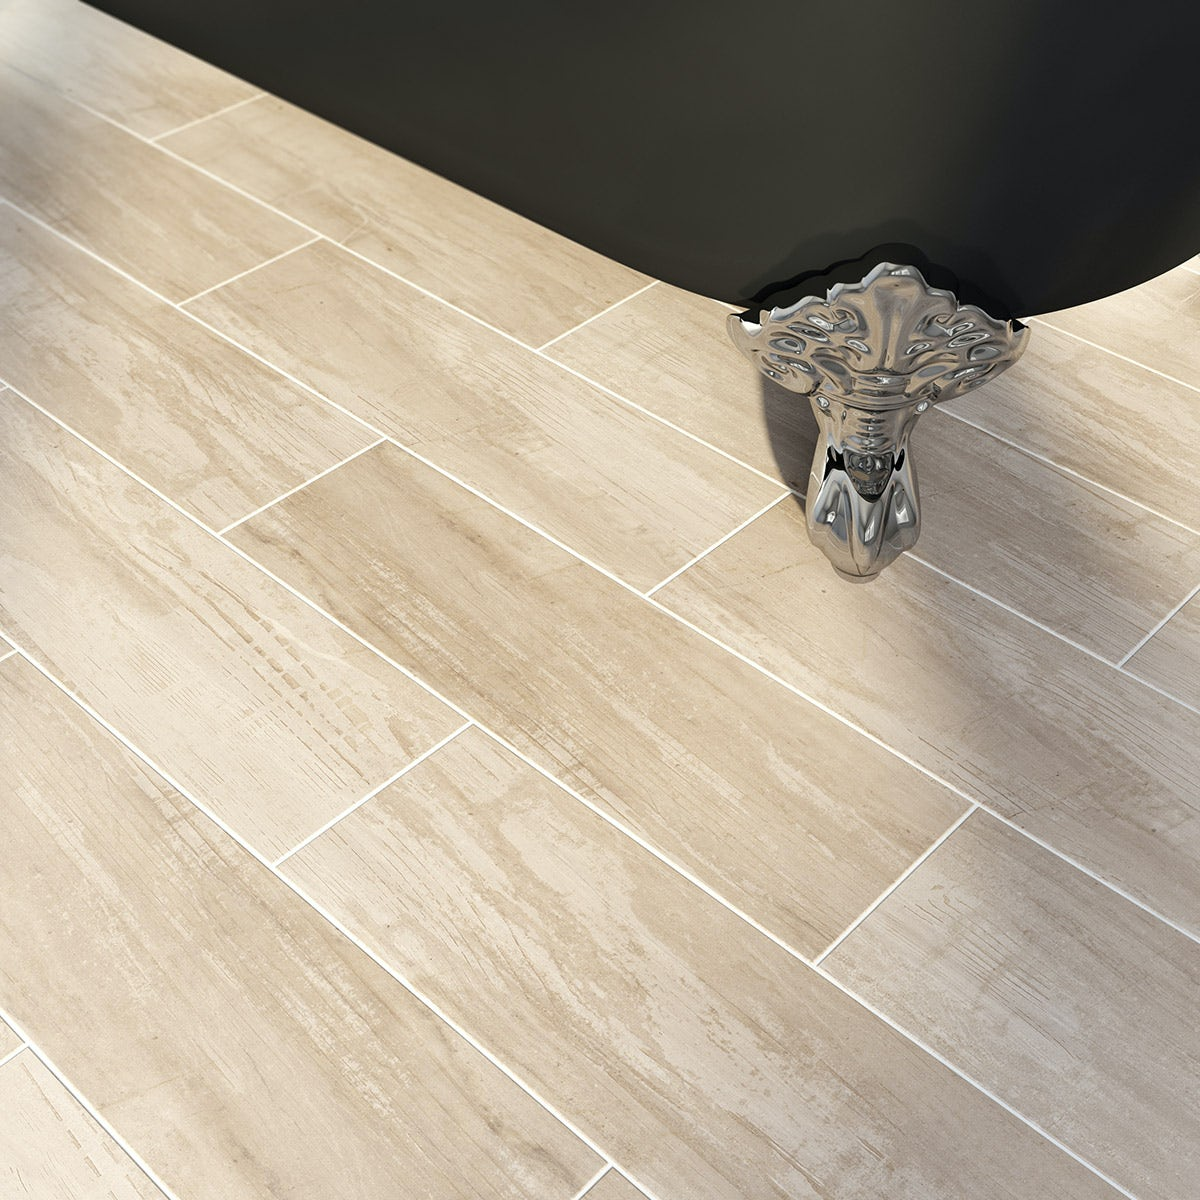 British Ceramic Tile Bark stone wood effect tile 148mm x 498mm